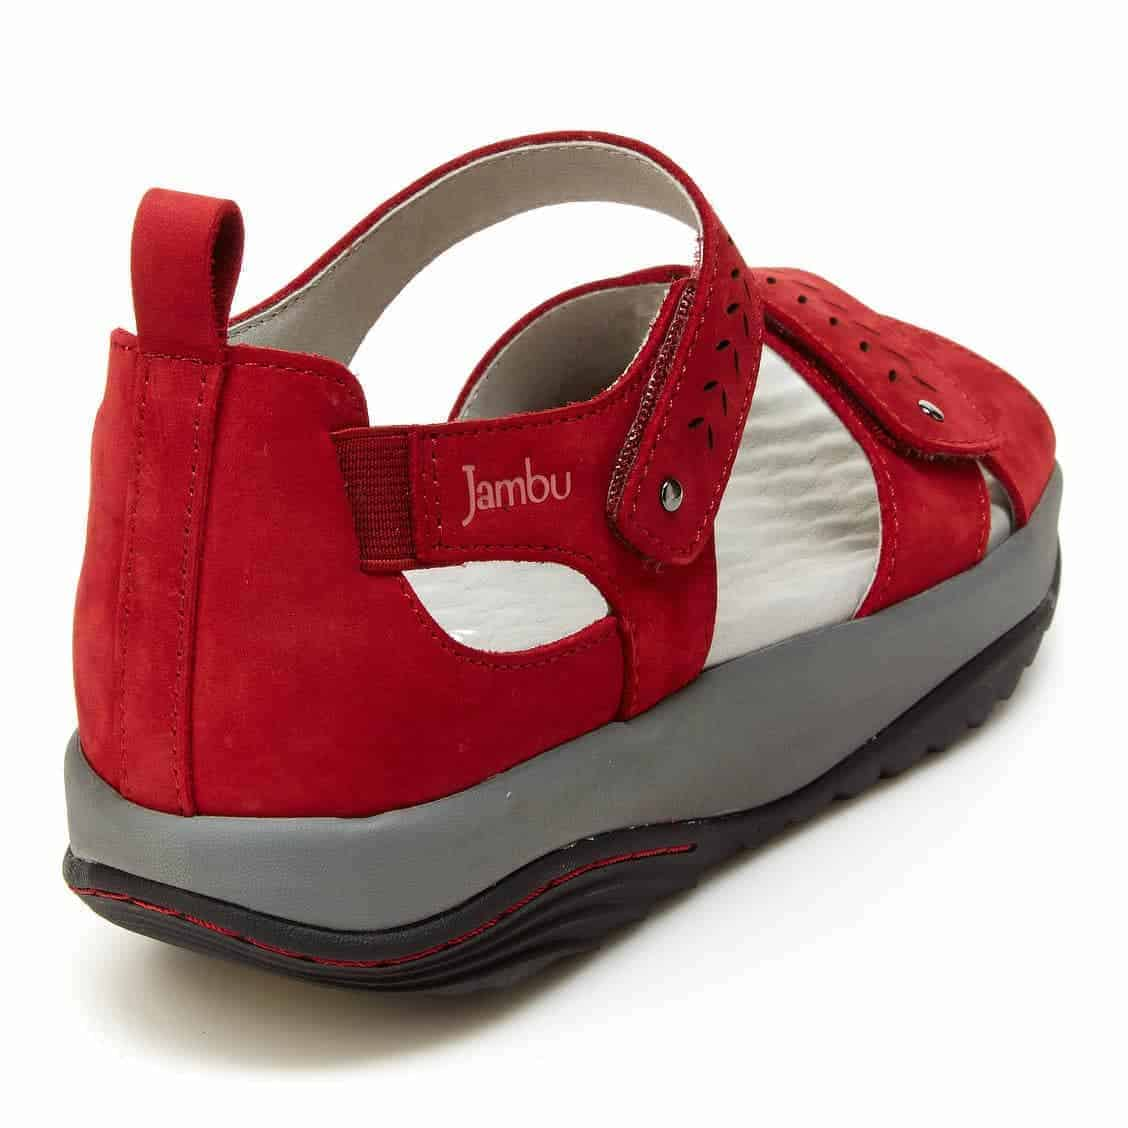 jambu-sedona-j1sed03-red-3